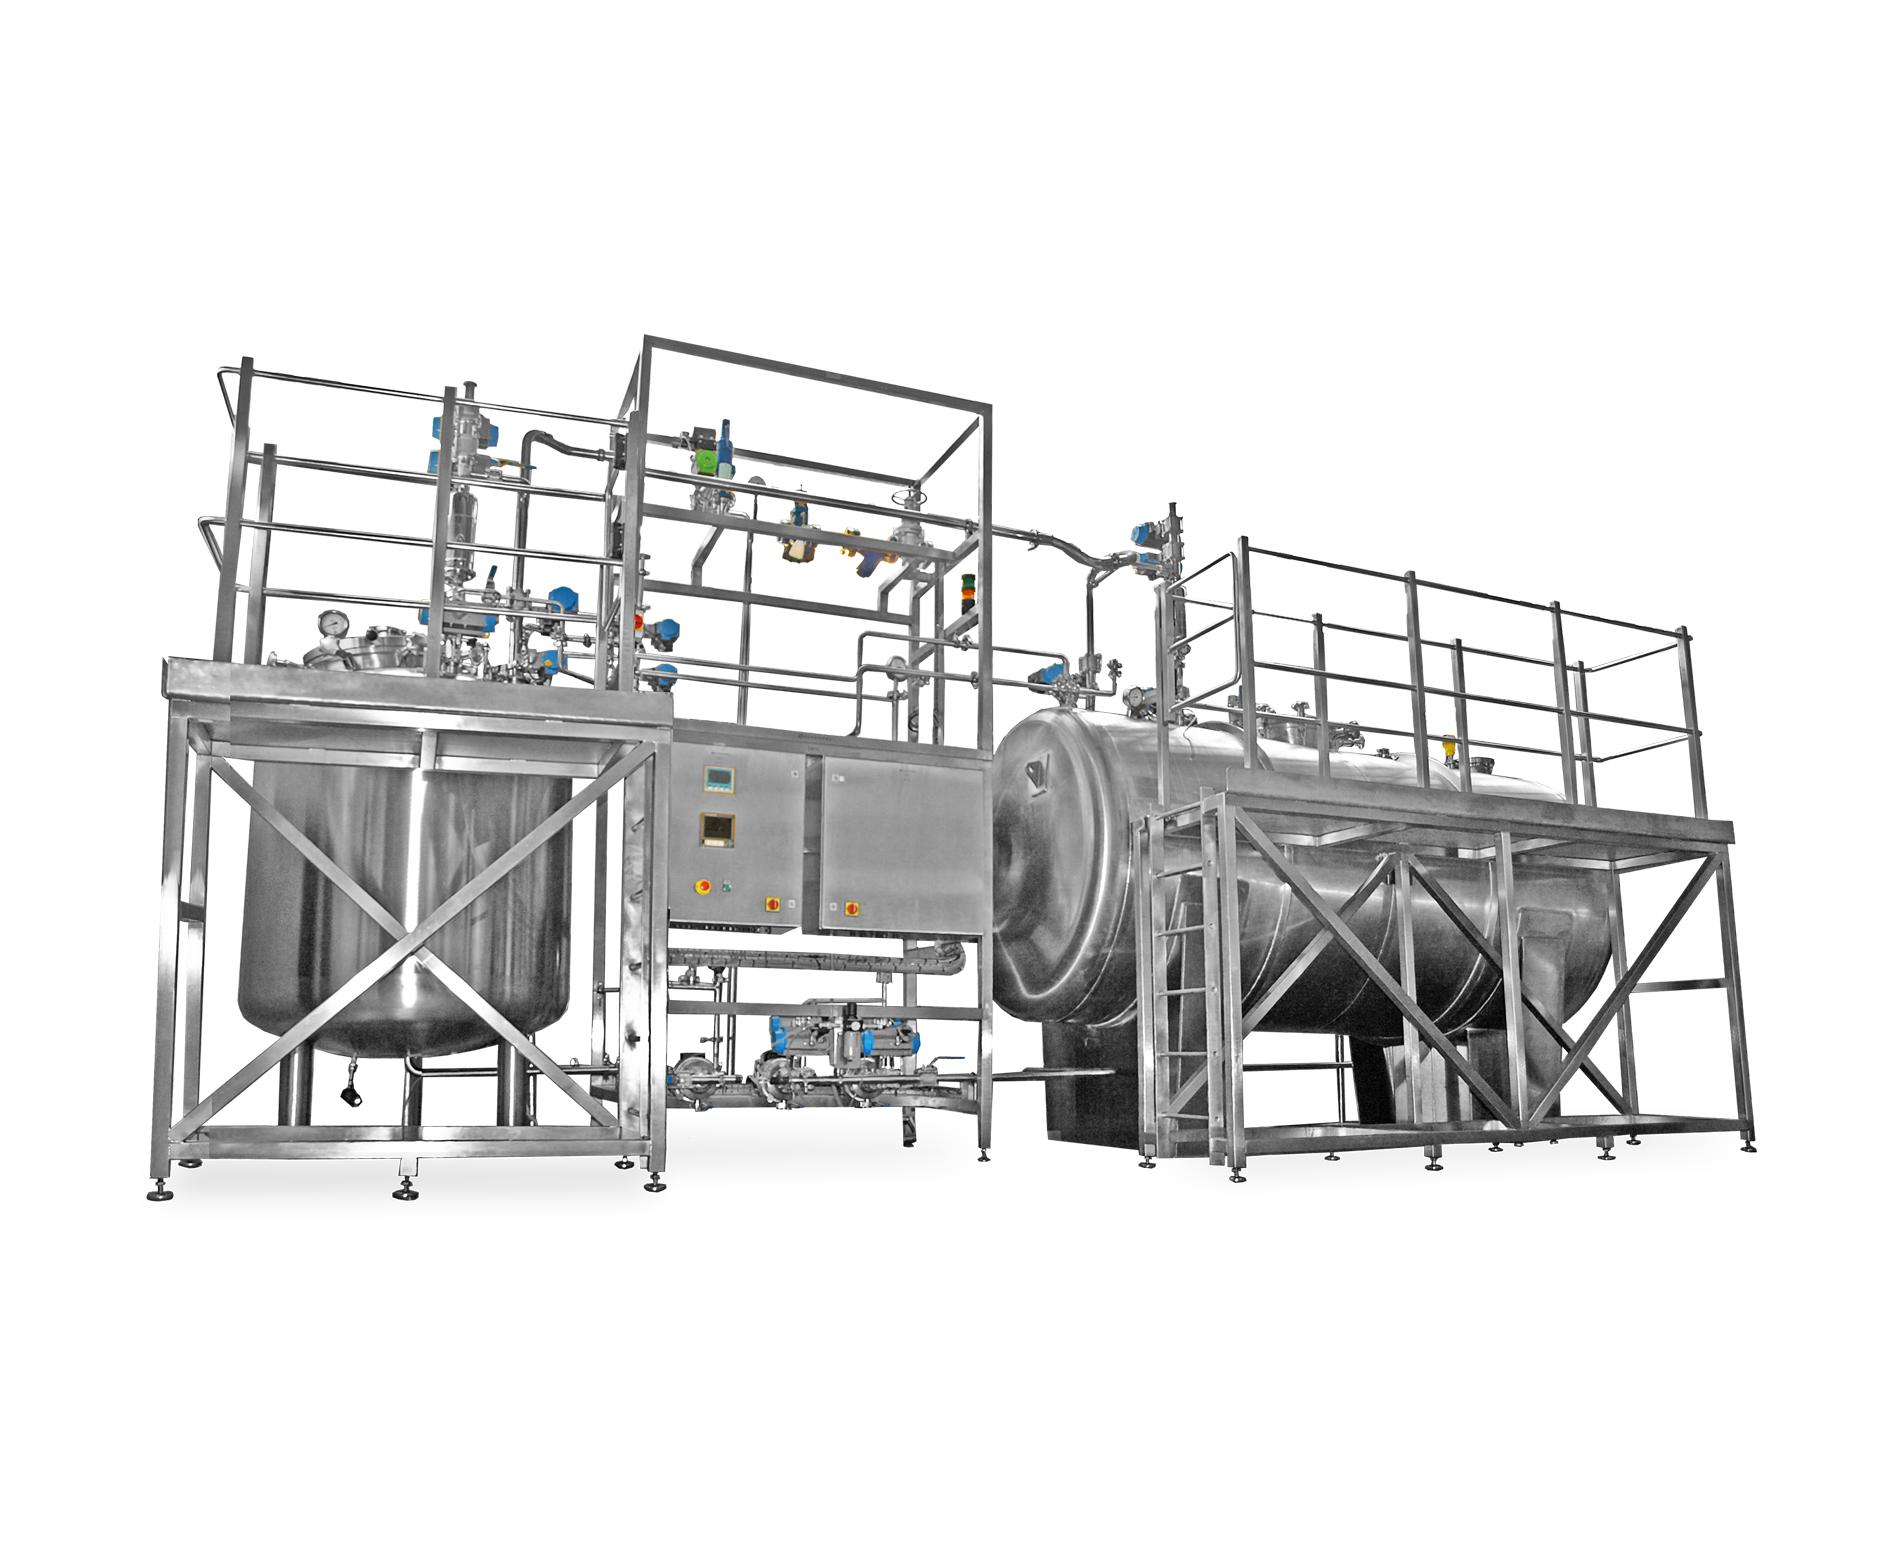 BIOWASTE - Decontamination Facilities, Biowaste Systems